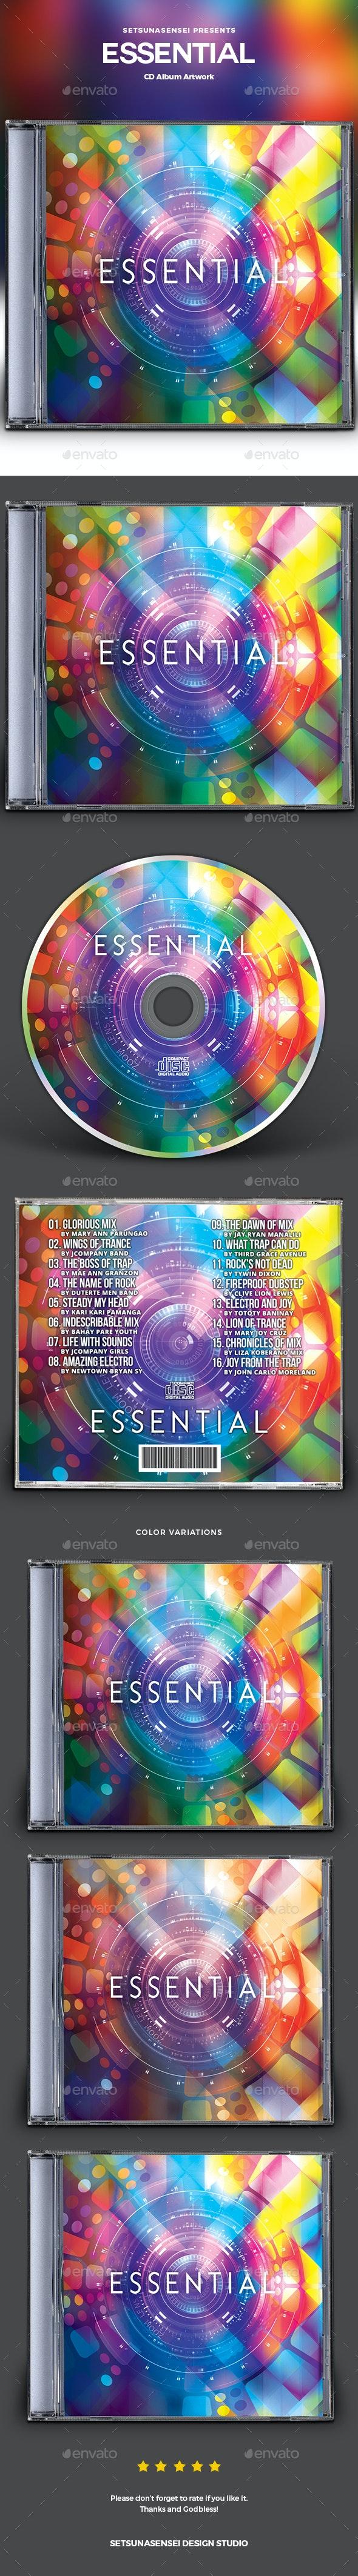 Essential CD Album Artwork - CD & DVD Artwork Print Templates